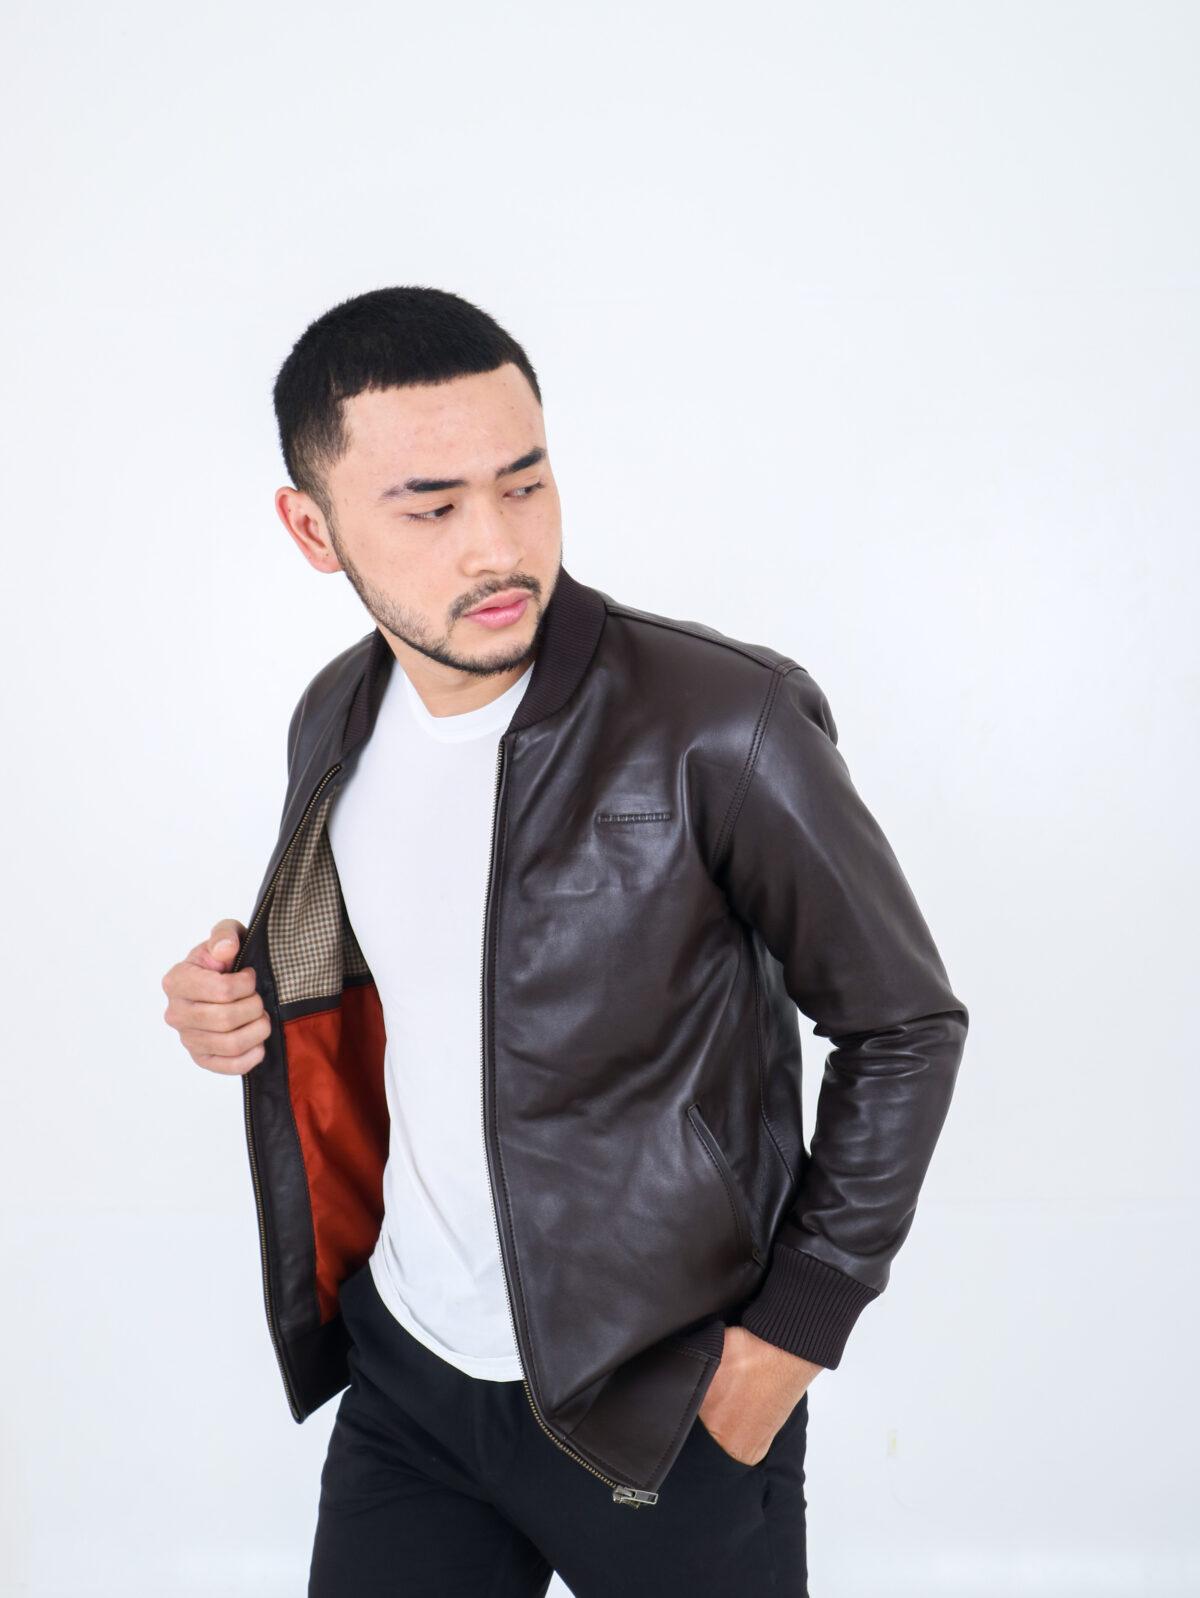 Blankenheim Leather Jacket Altair – Brown (Size S M L XL)